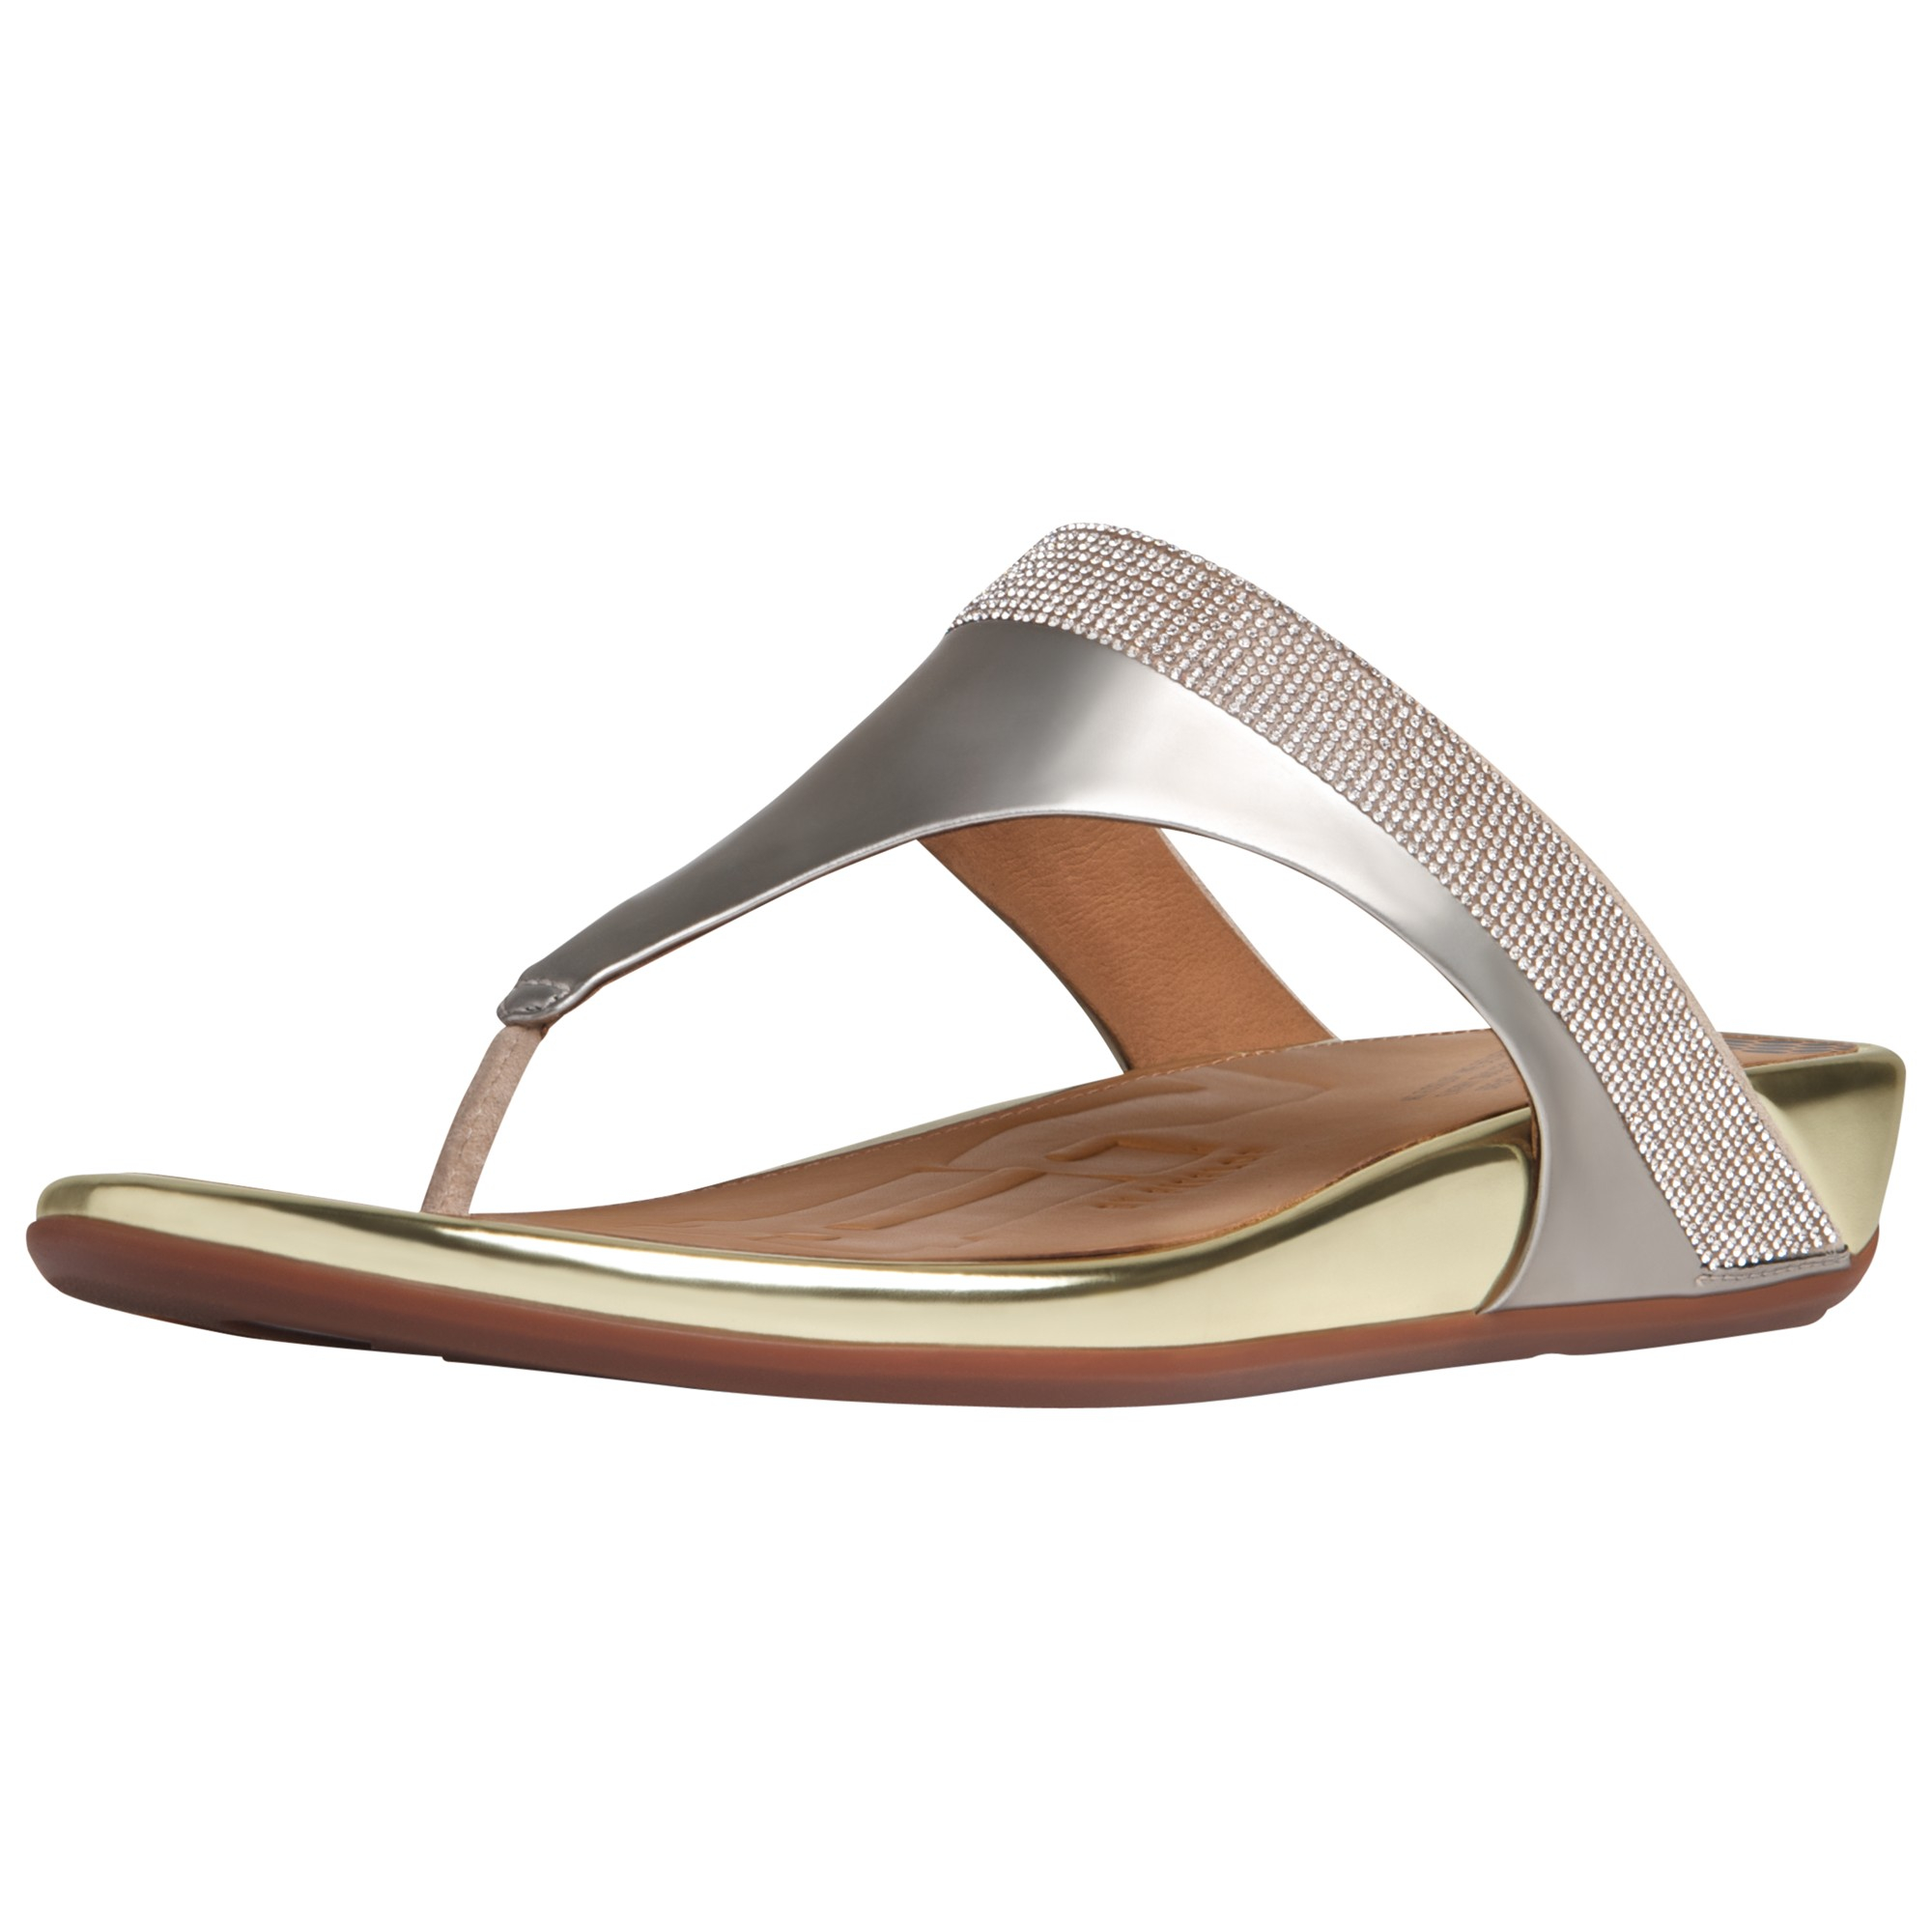 f339c506f4b3c Fitflop Banda Crystal Leather Toe Post Sandals in Metallic - Lyst